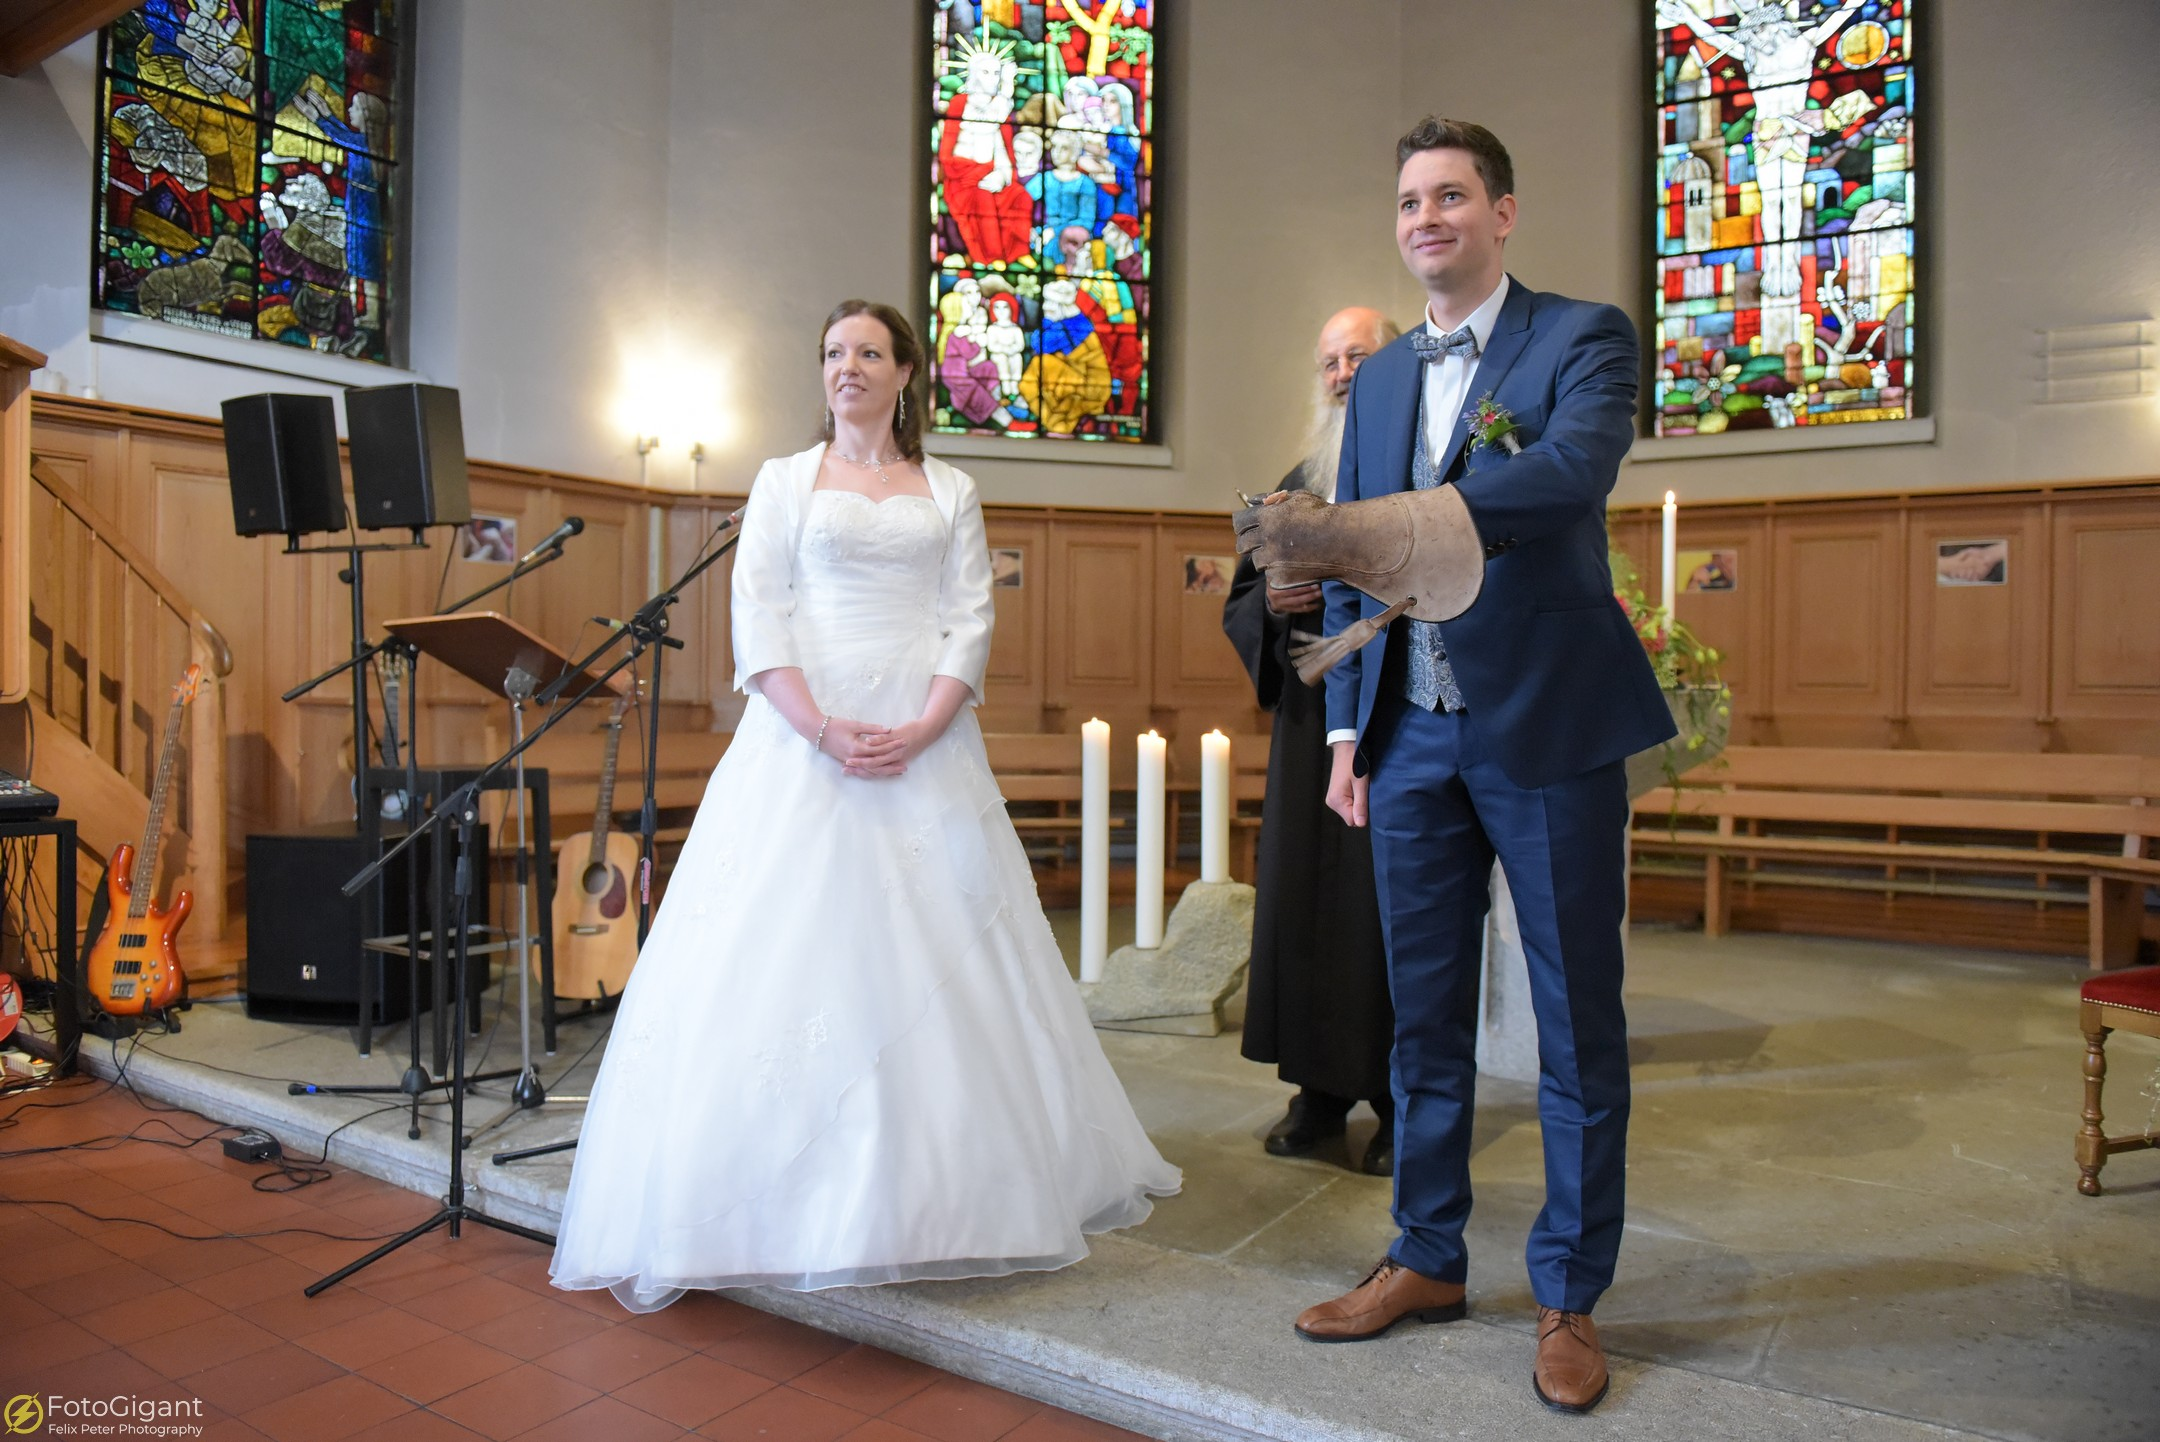 Hochzeitsfotograf_Frutigen_Bern_12.jpg